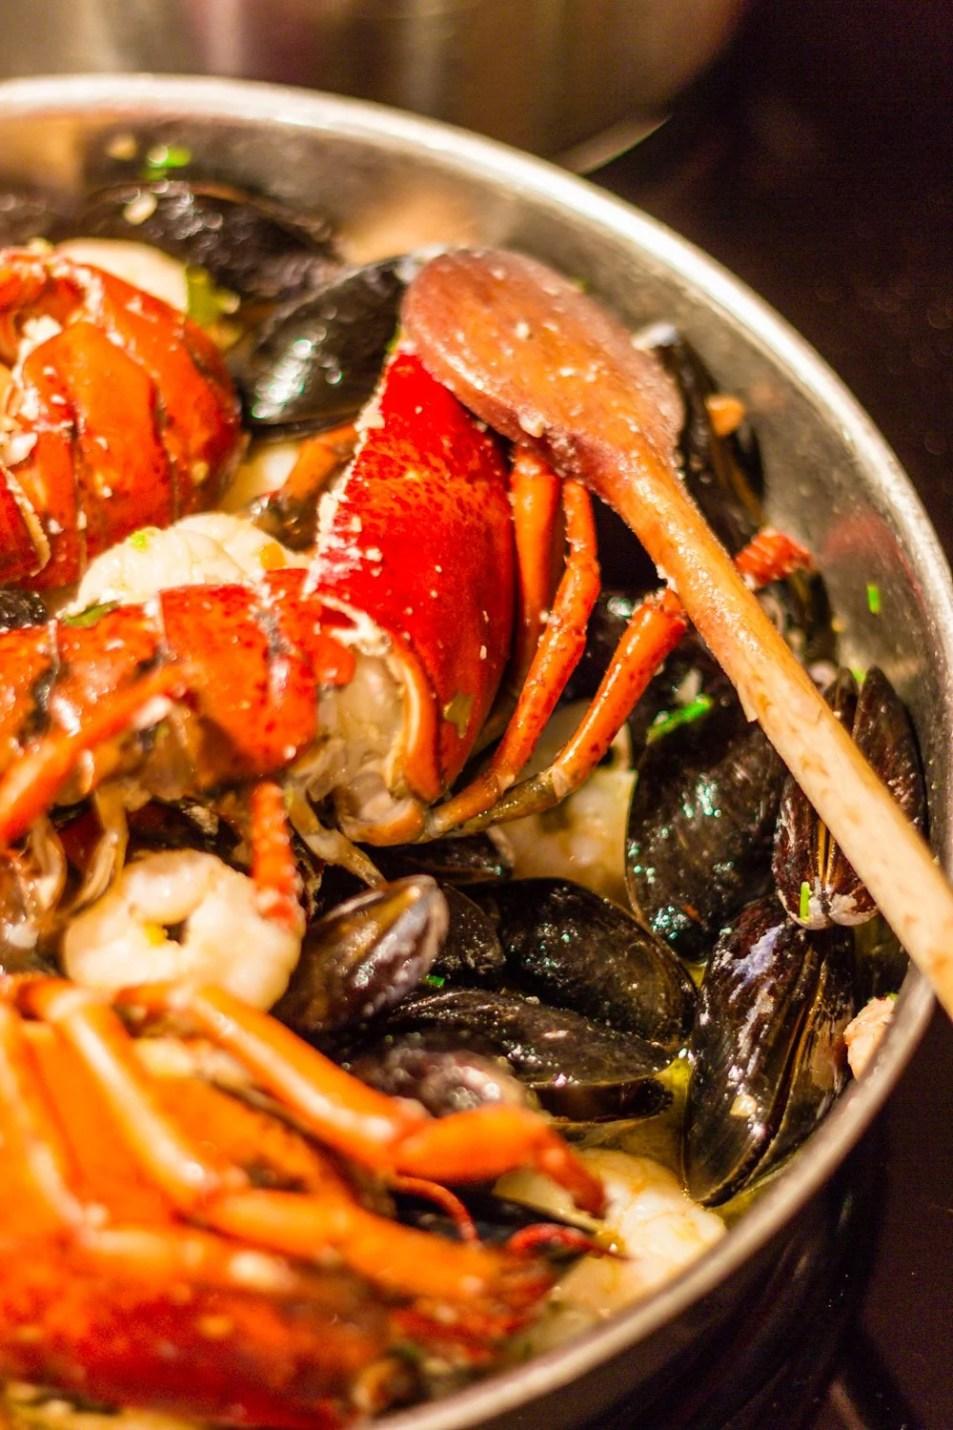 Nelson_Carvalheiro_Portuguese_Seafood_Rice_Recipe (15)